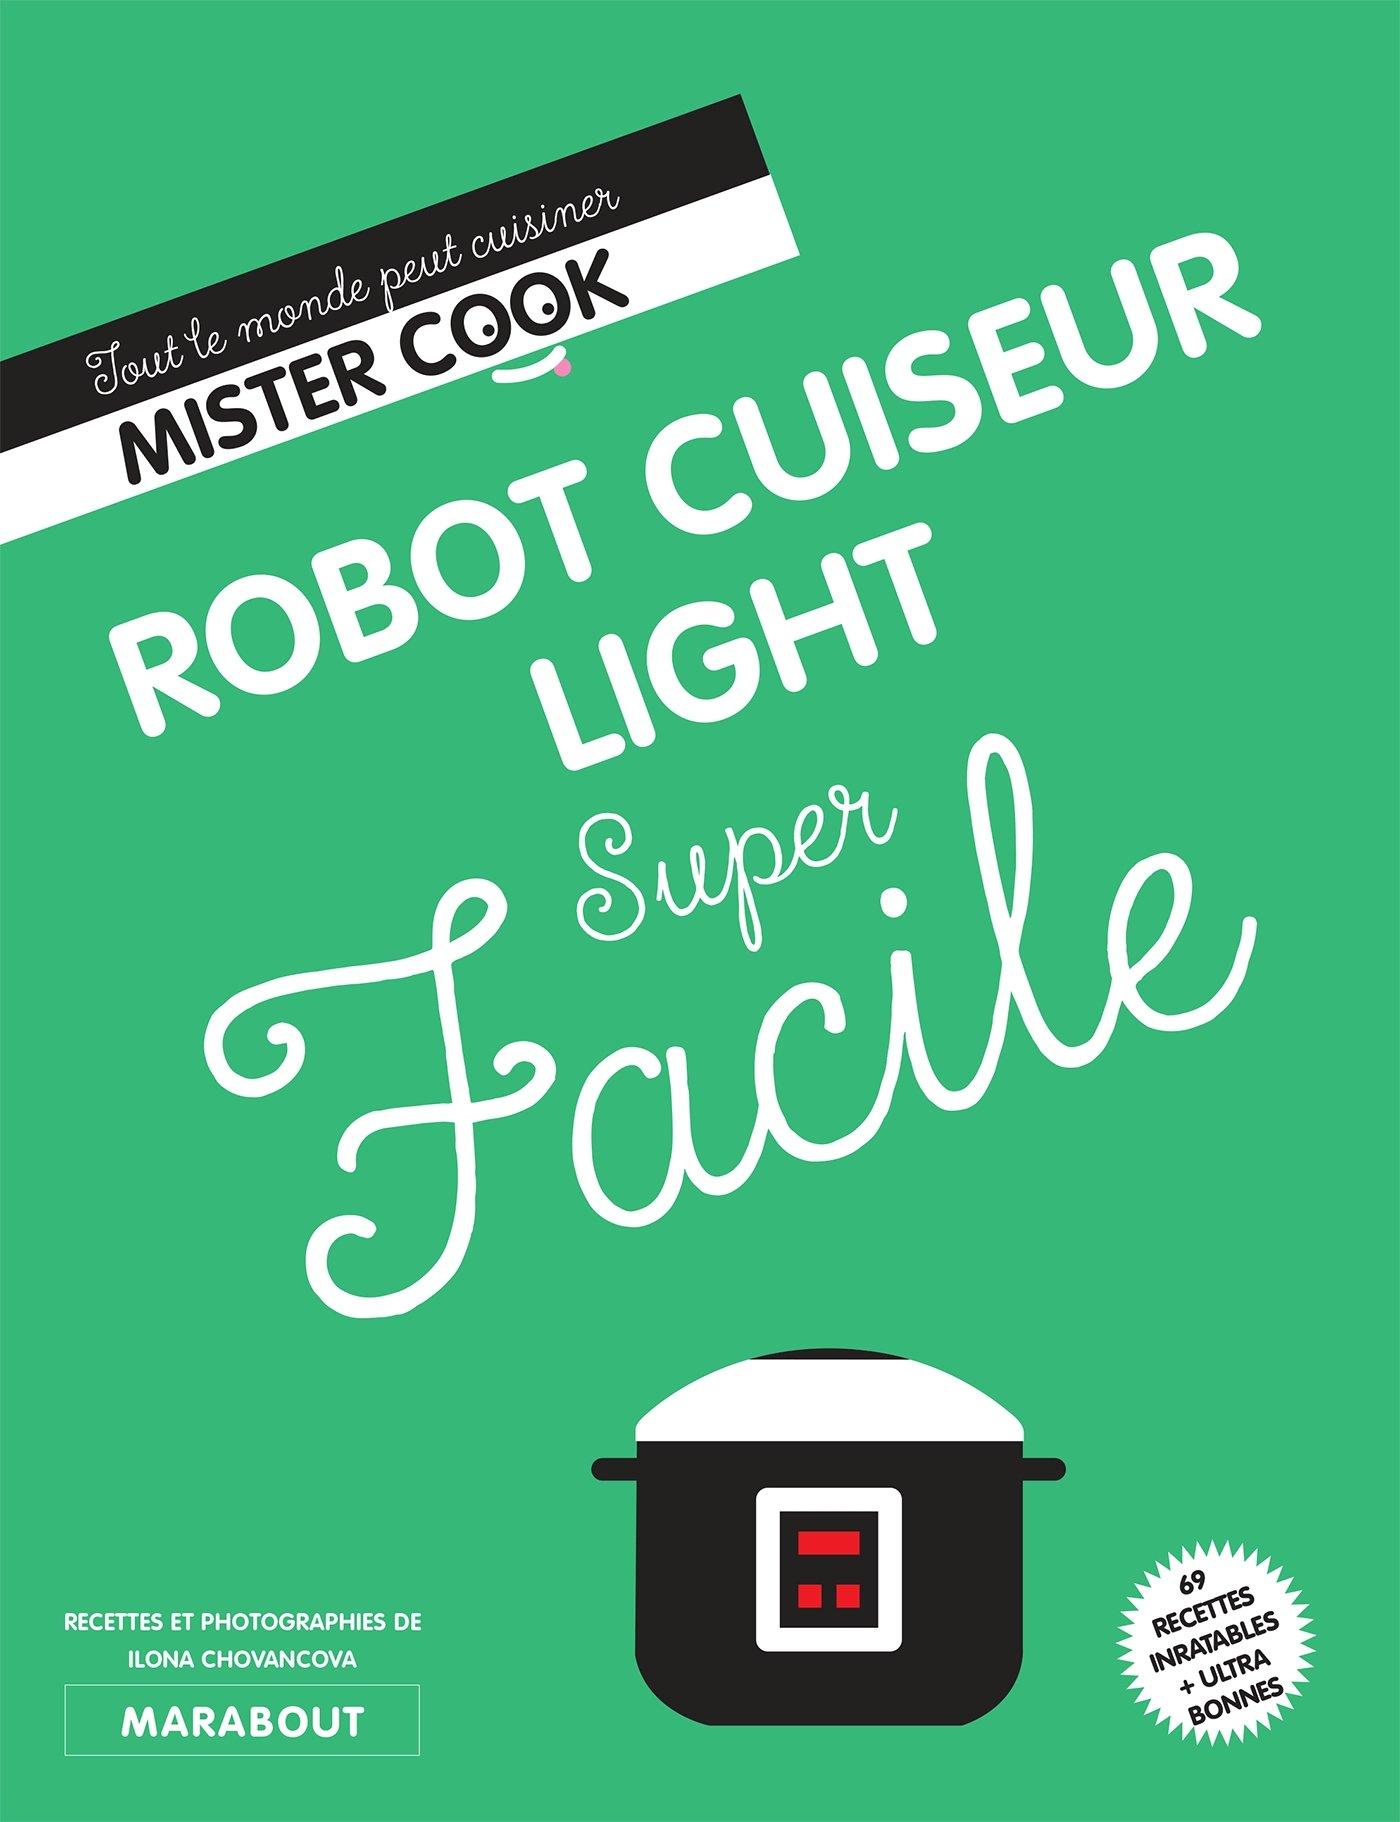 Robot cuiseur Light: 24699 (Cuisine): Amazon.es: Collectif: Libros en idiomas extranjeros